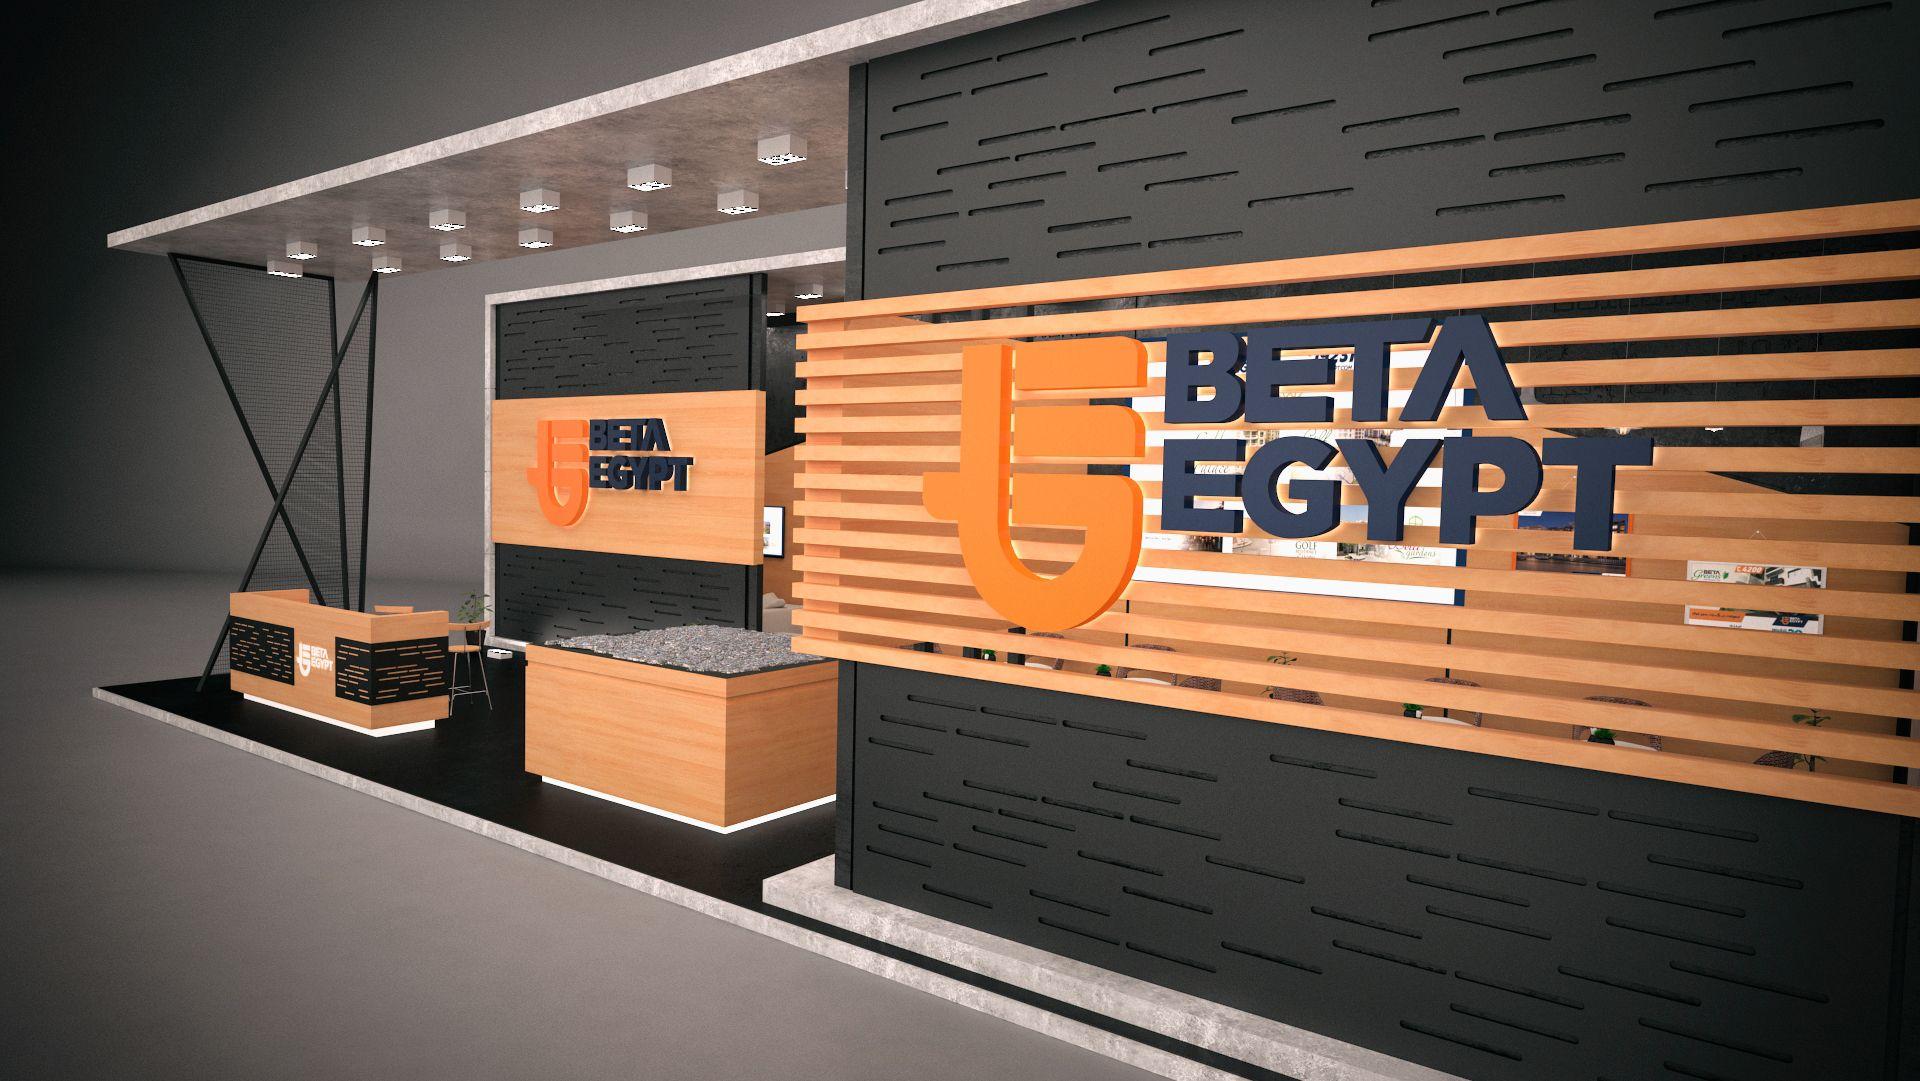 Expo Stand Egitto : Beta egypt exhibition booth design ideas exhibition booth design